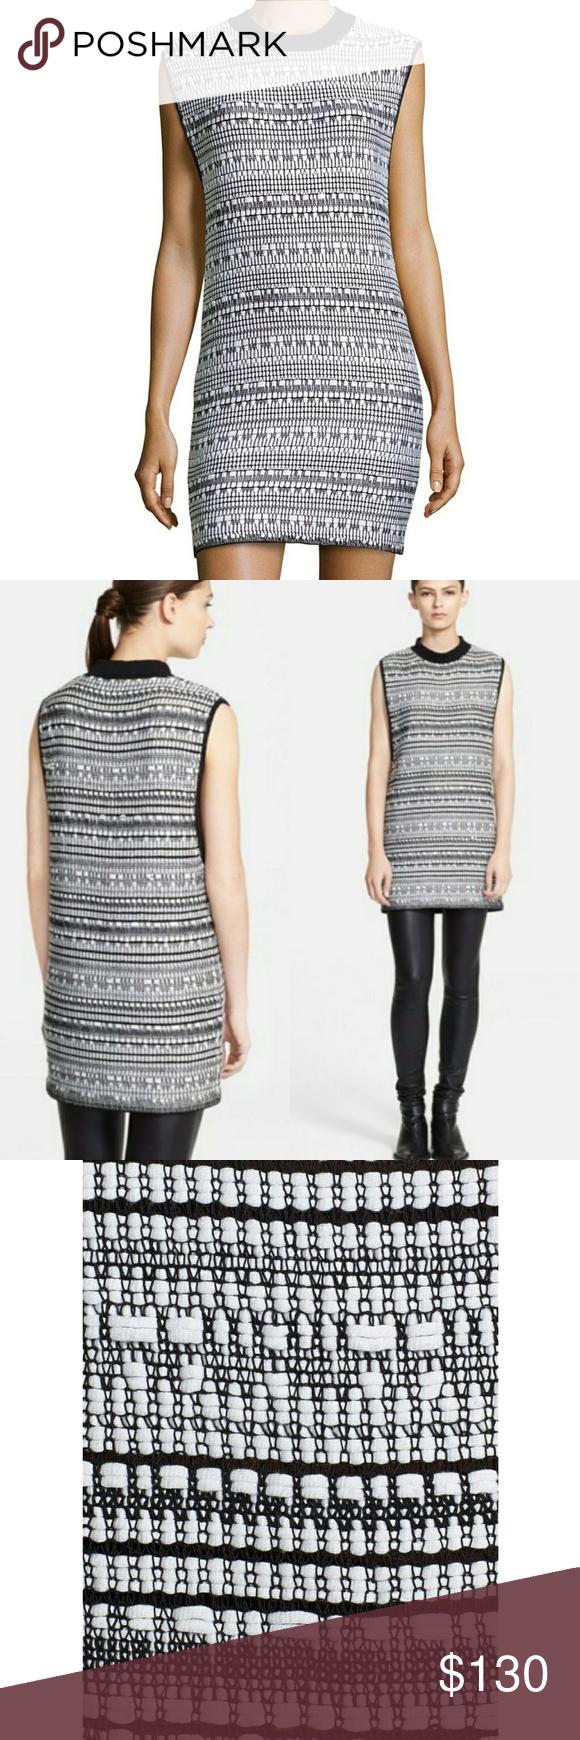 439307ea972 🎀NWT🎀 Helmut Lang Sleeveless Variant Print Dress BRAND🆕 Mock collar